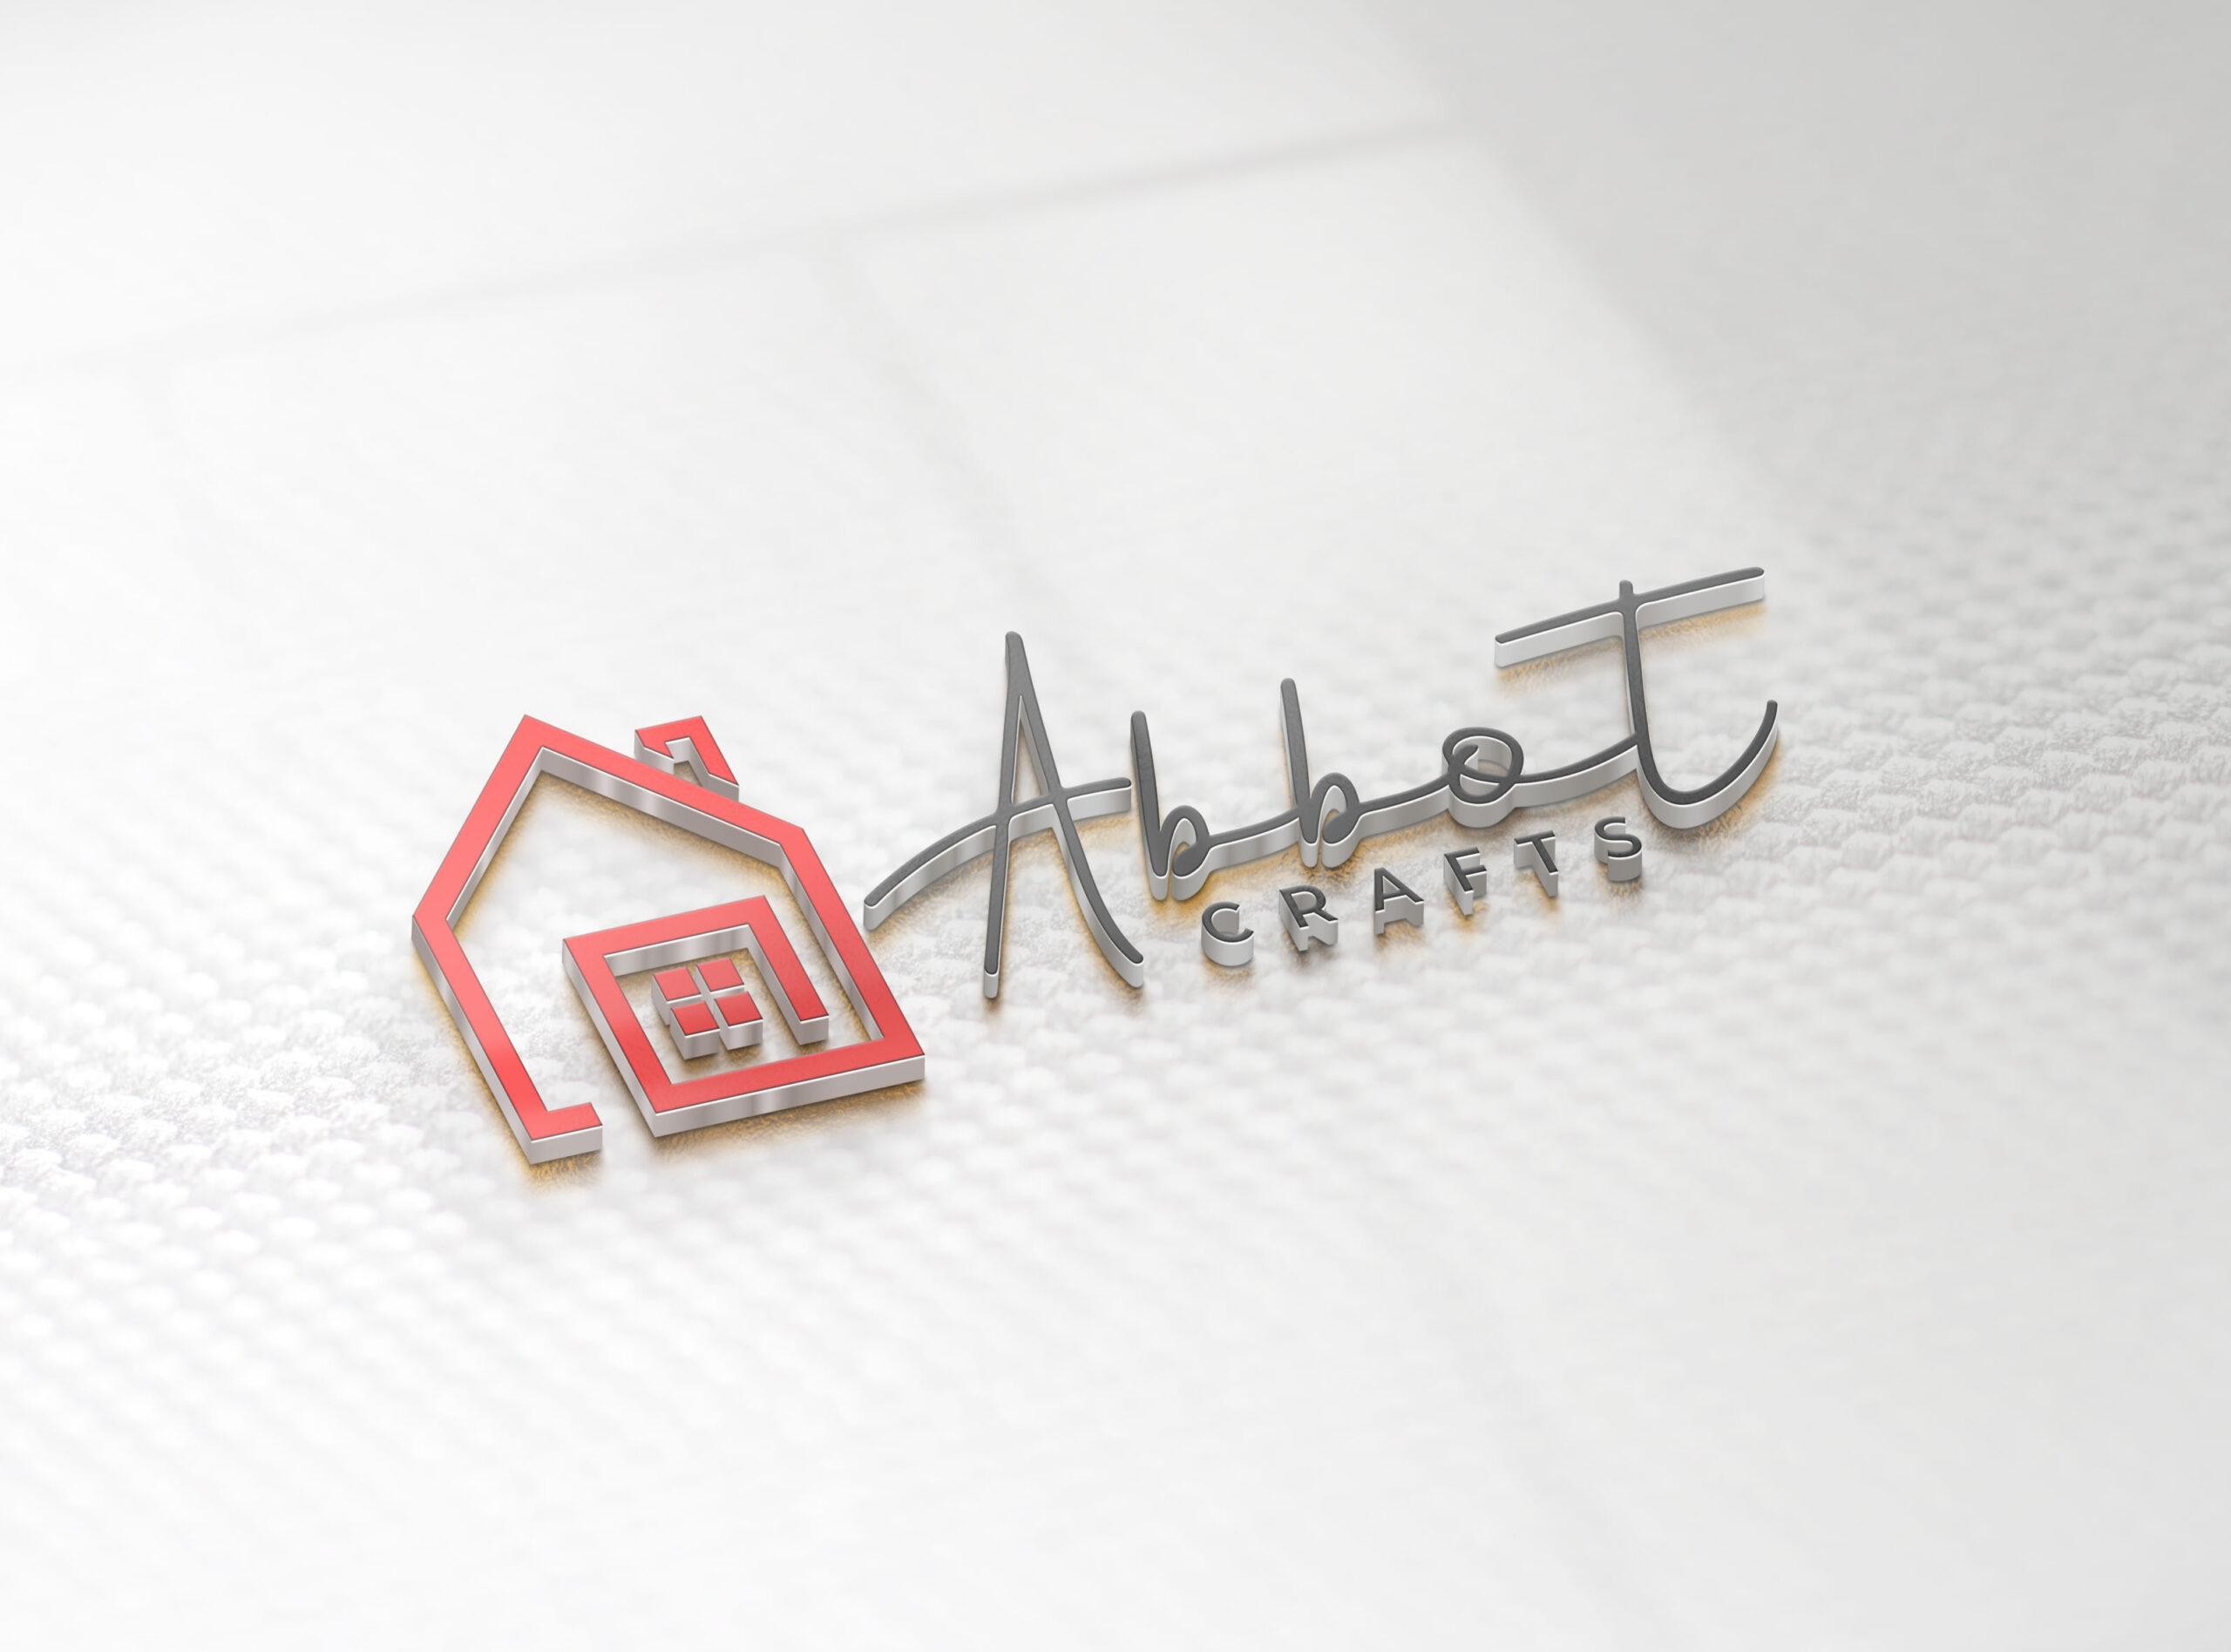 abbotcrafts logo